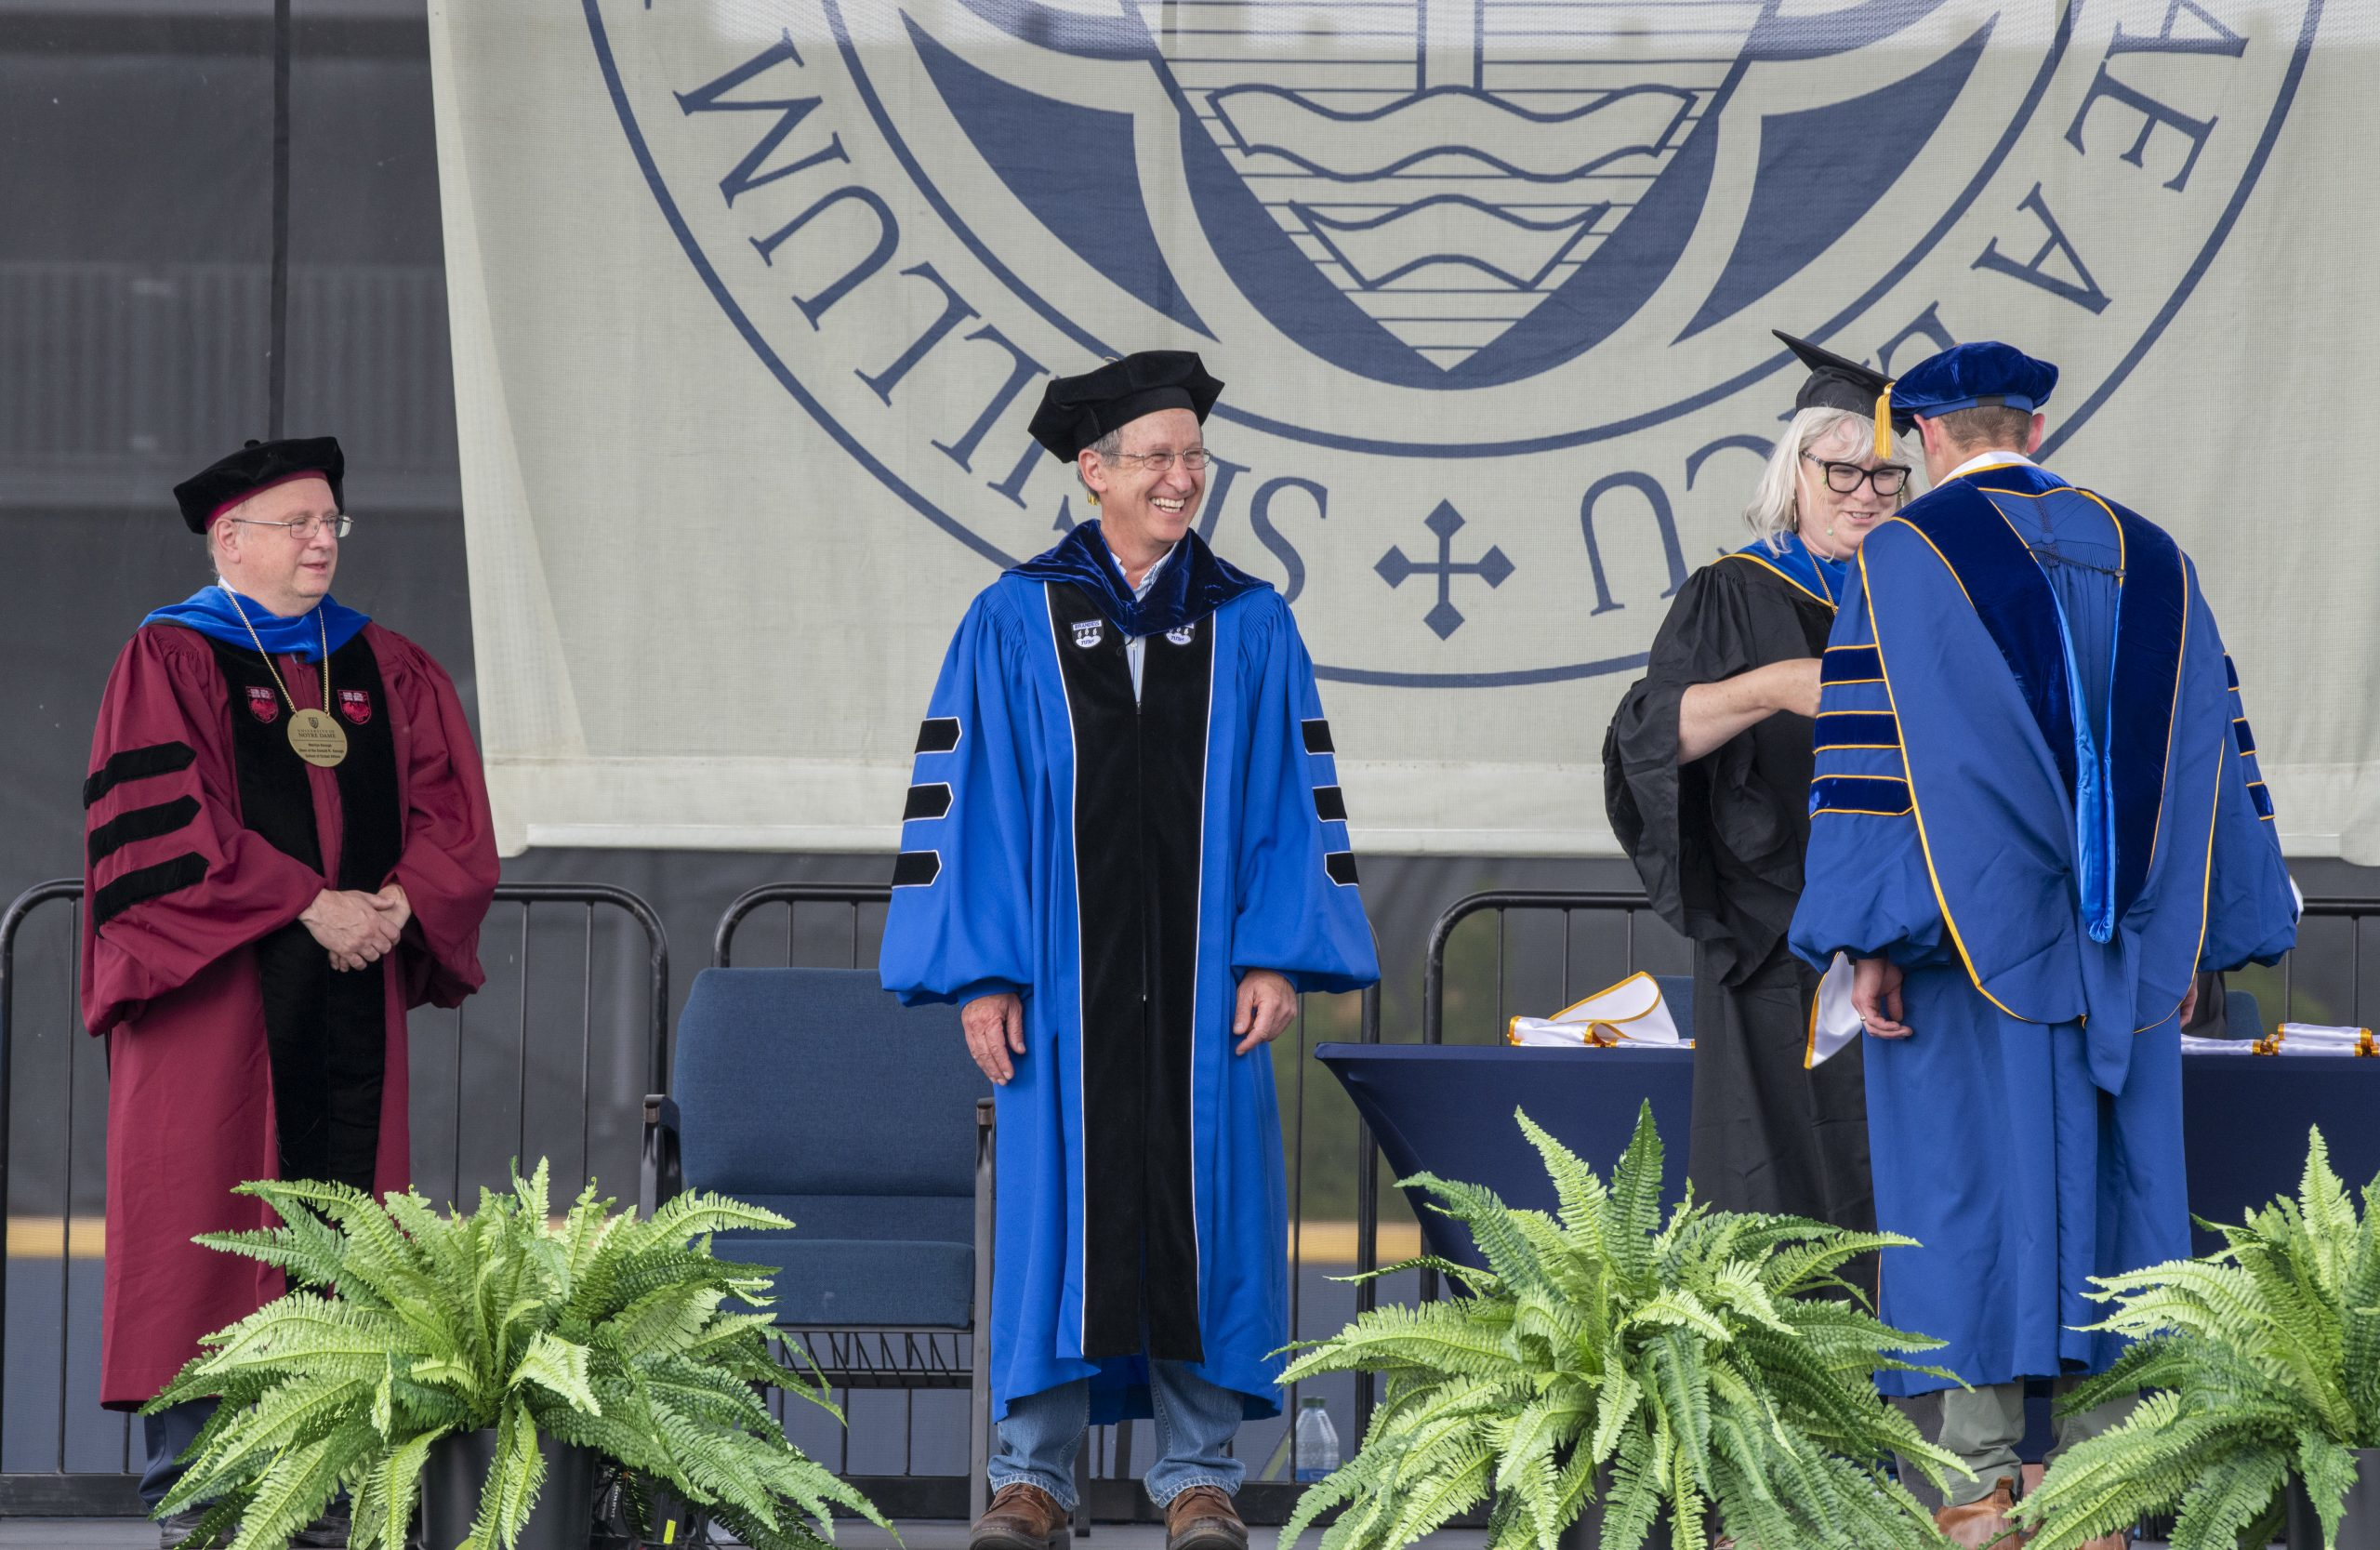 PhD student Drew Marcantonio receives his graduation stole on stage.